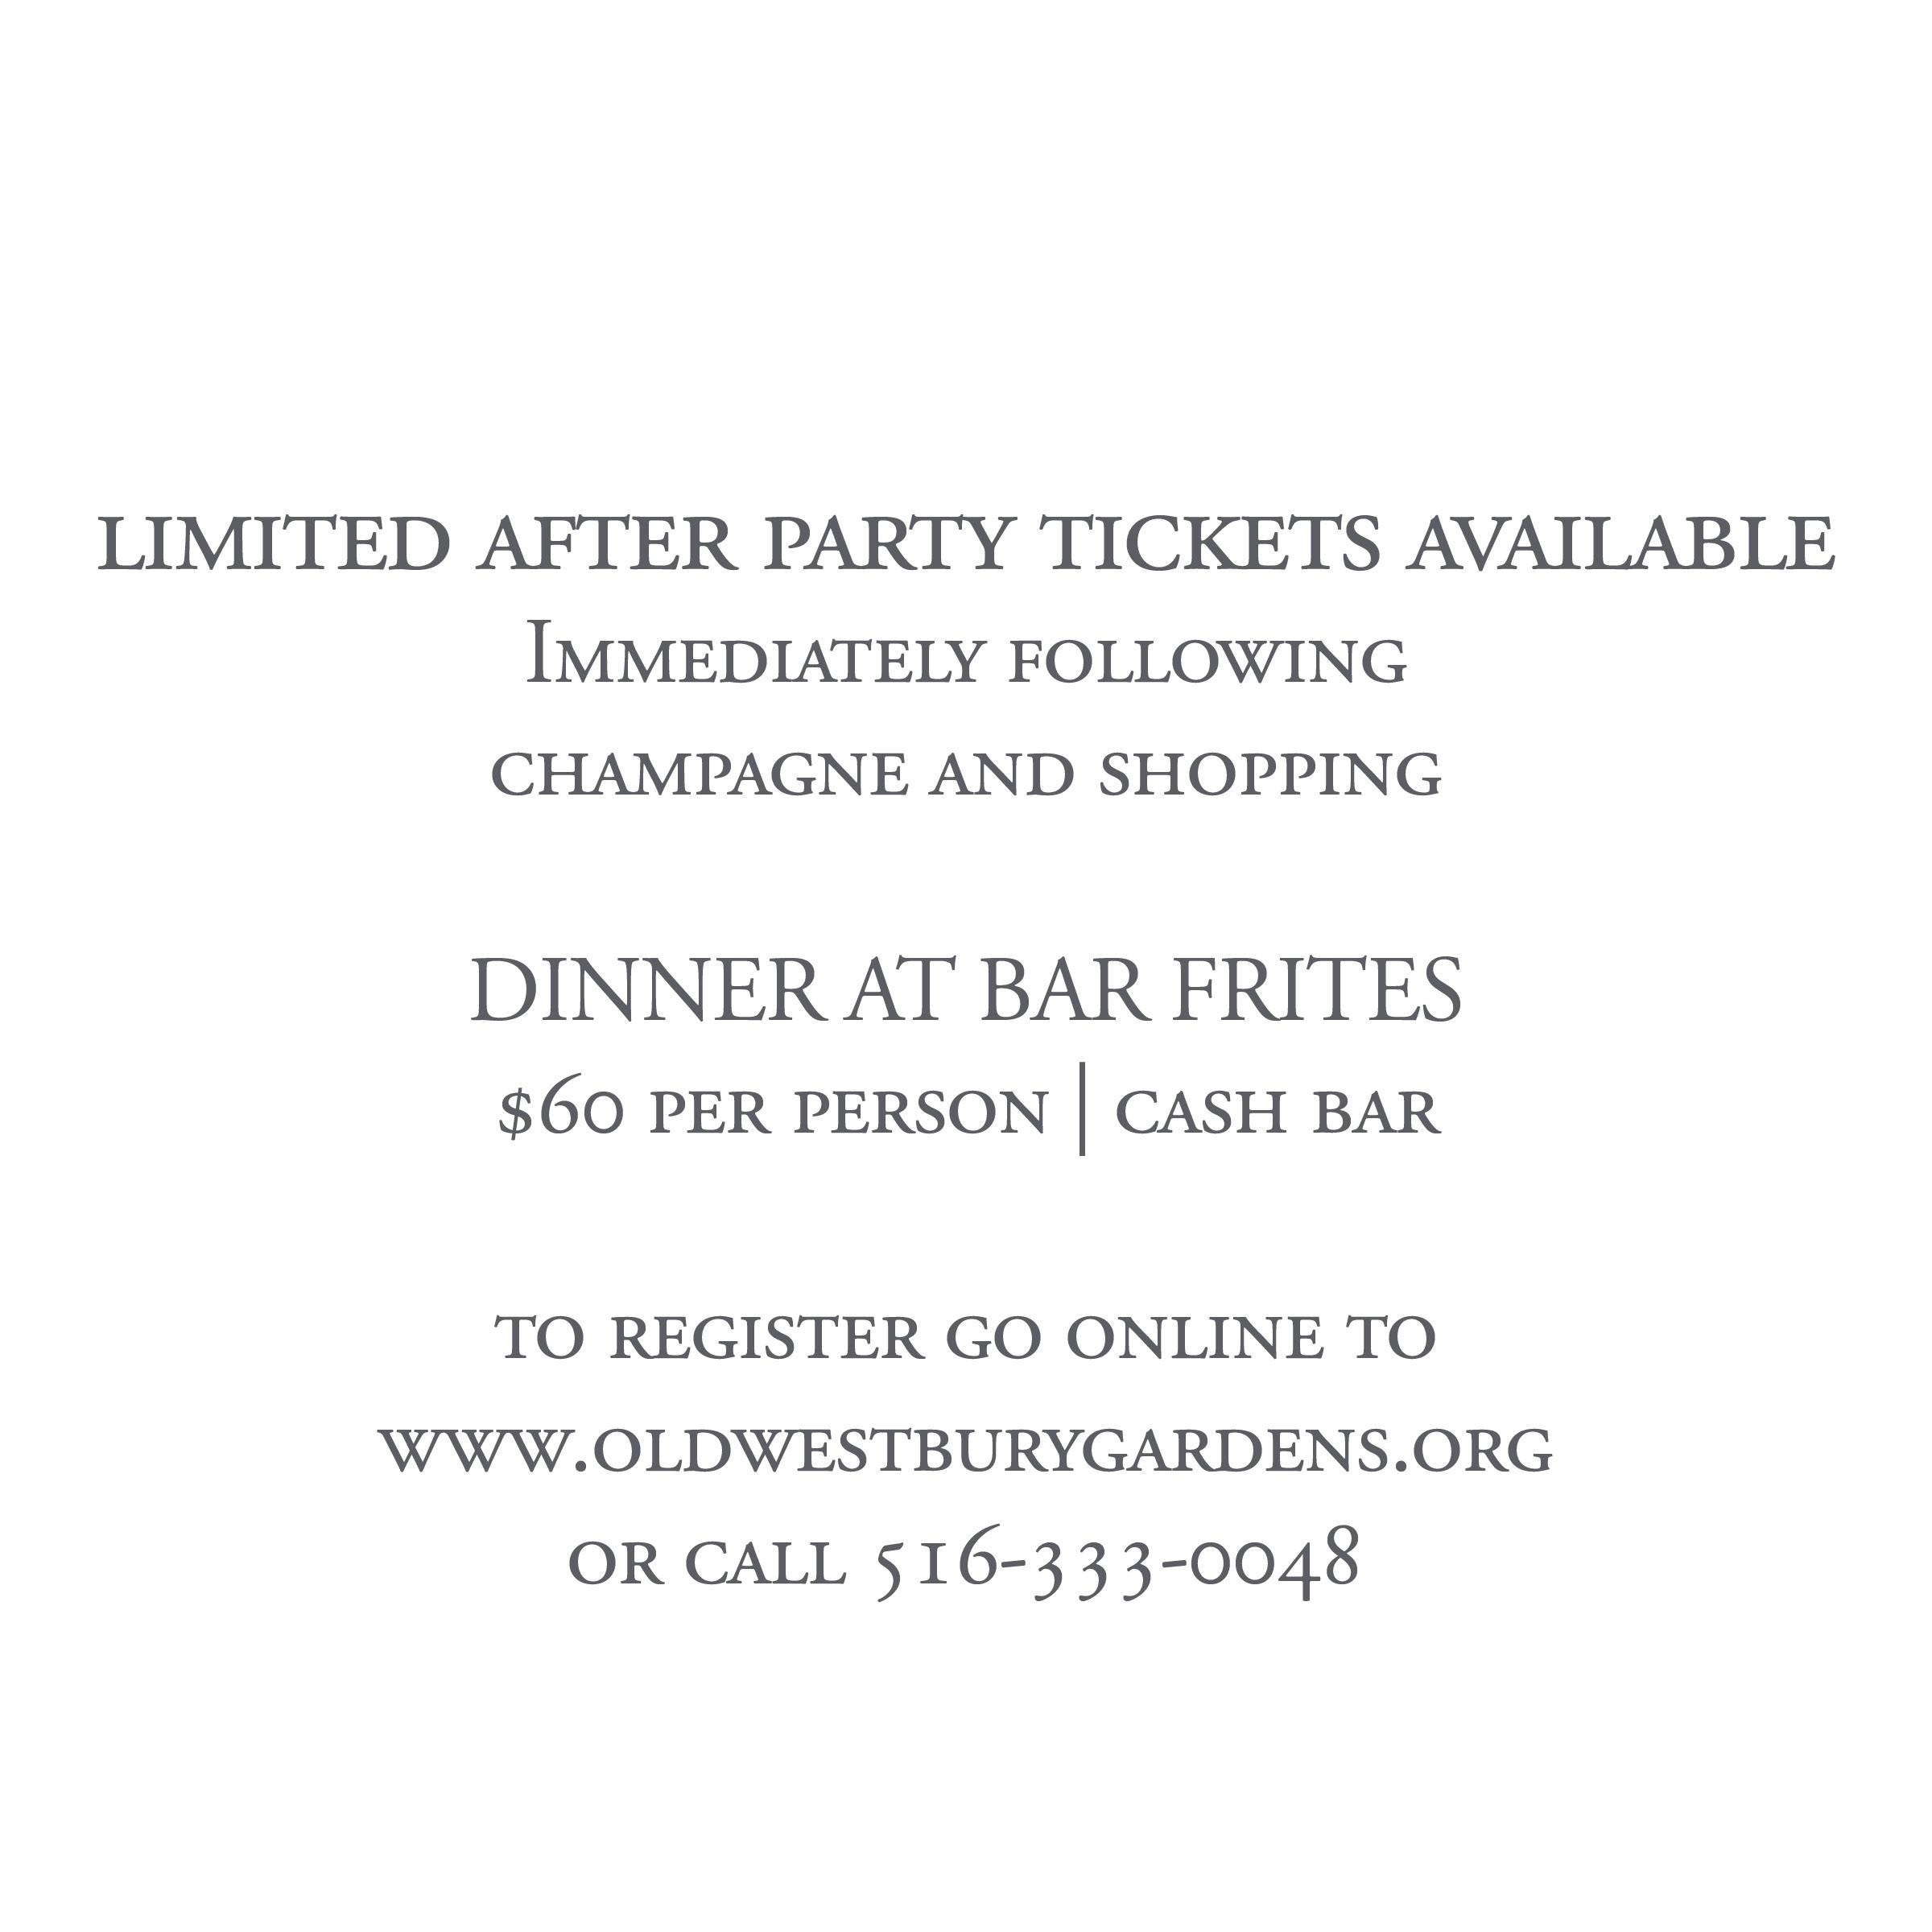 CIB London Jewelers Party Invite web3.jpg